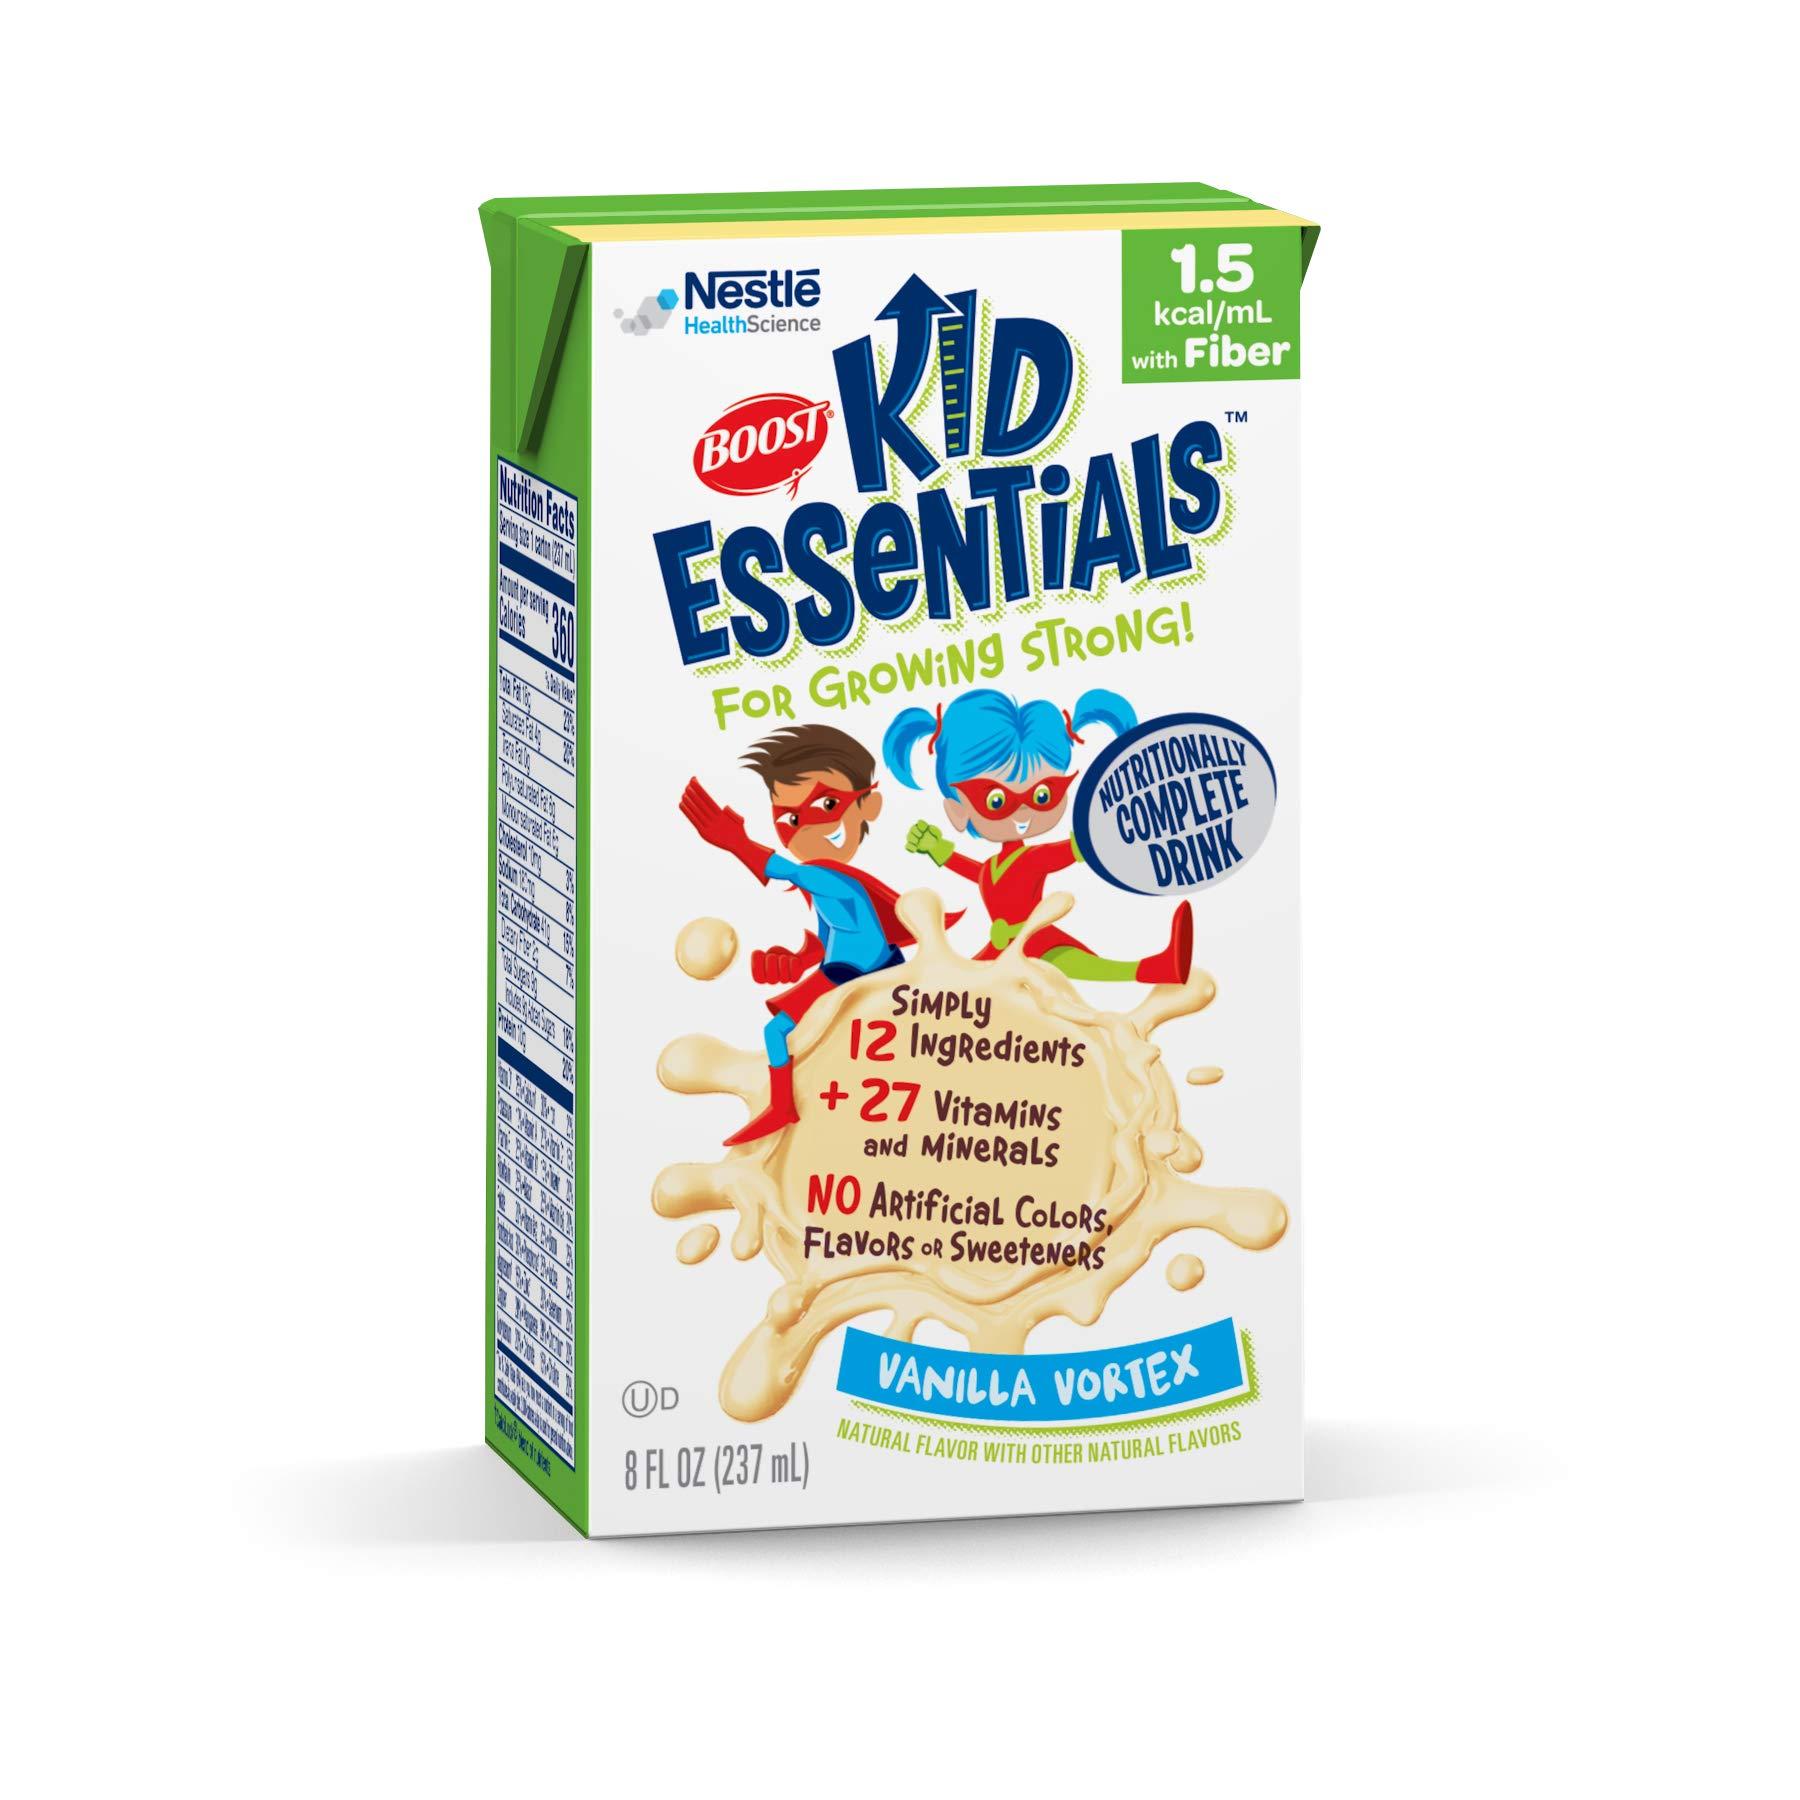 Boost Kid Essentials 1.5 Nutritionally Complete Drink, Vanilla Vortex, 8 Ounce, Pack of 27 by Boost Kids Essentials